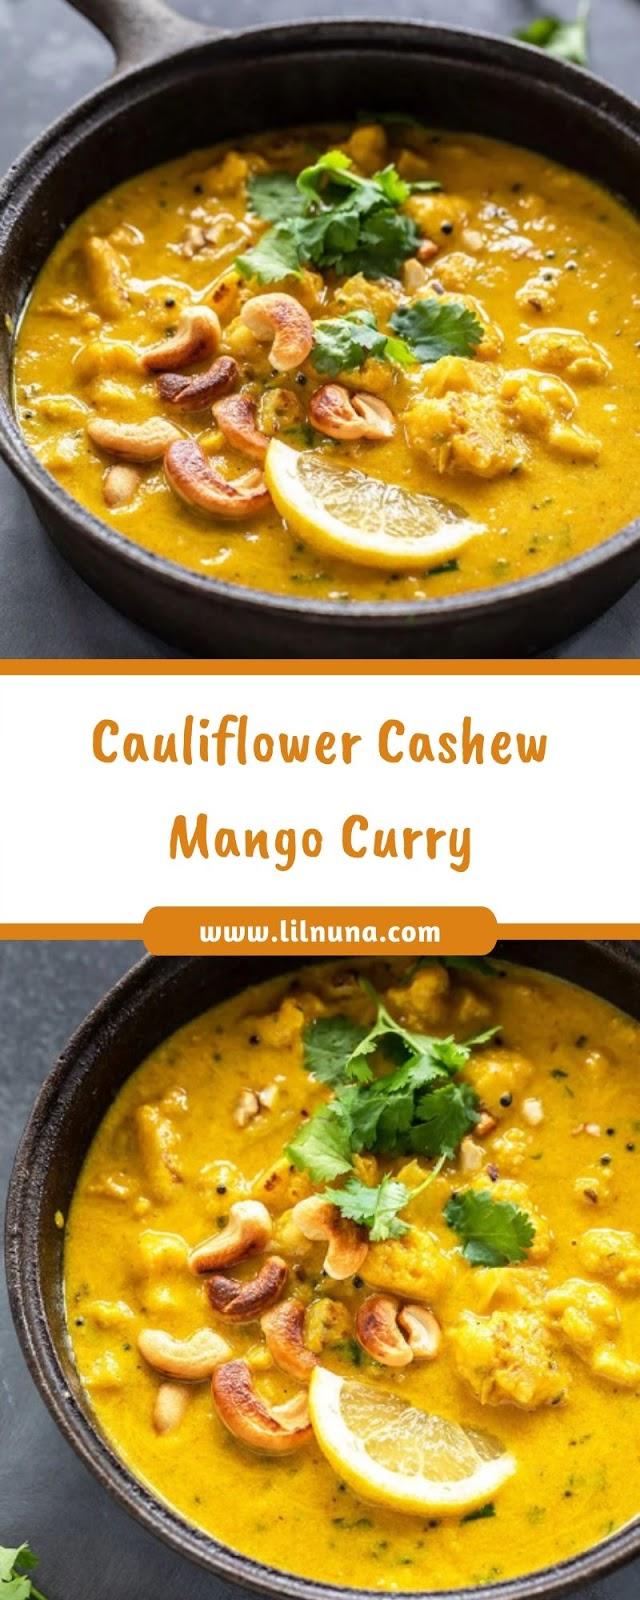 Cauliflower Cashew Mango Curry